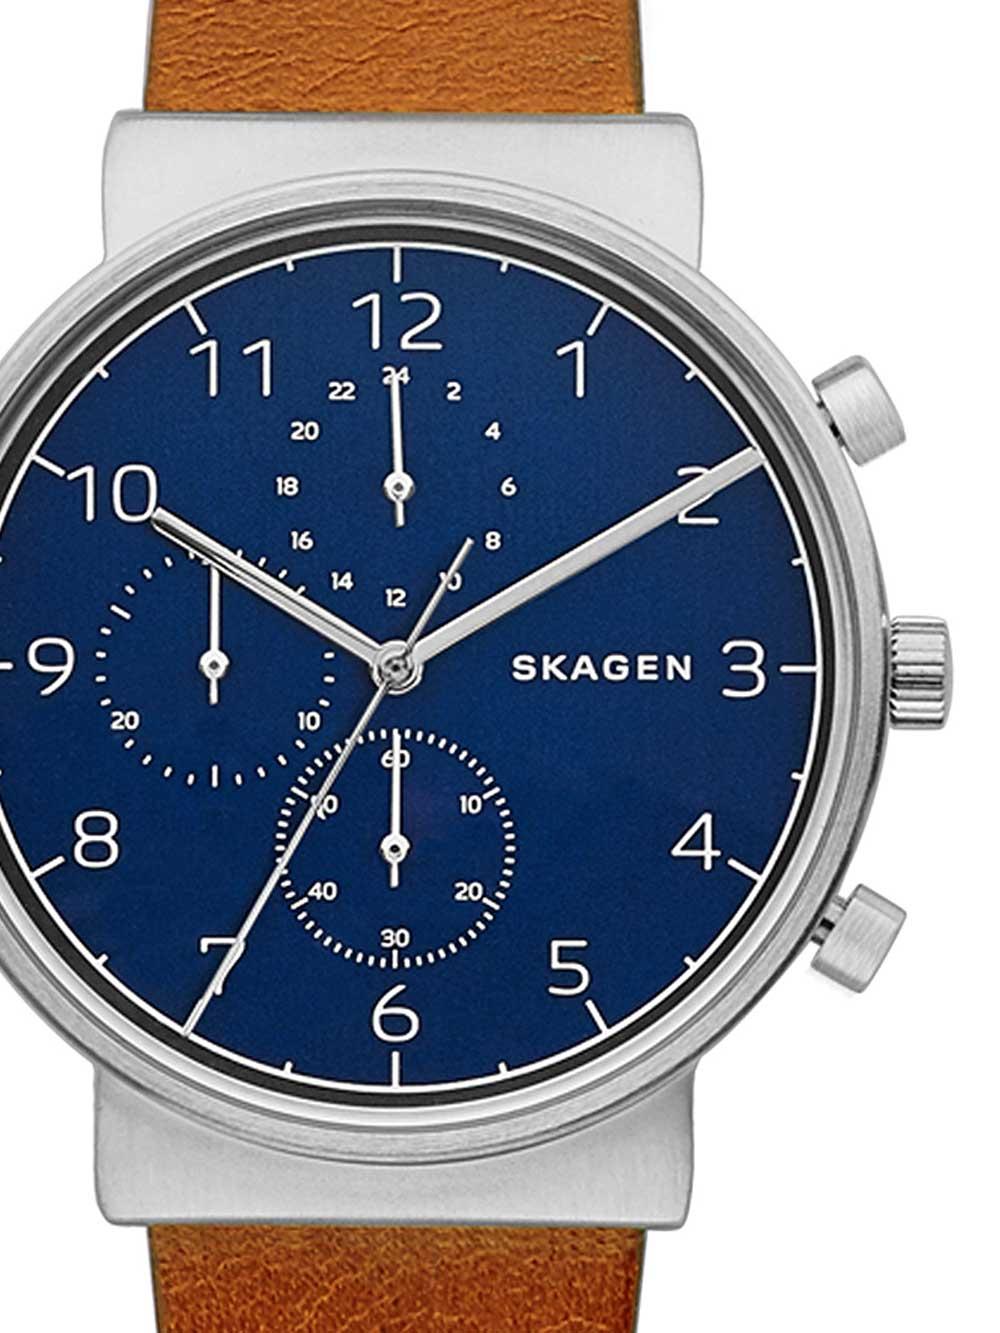 Skagen SKW6358 Chronograph 40mm 5ATM